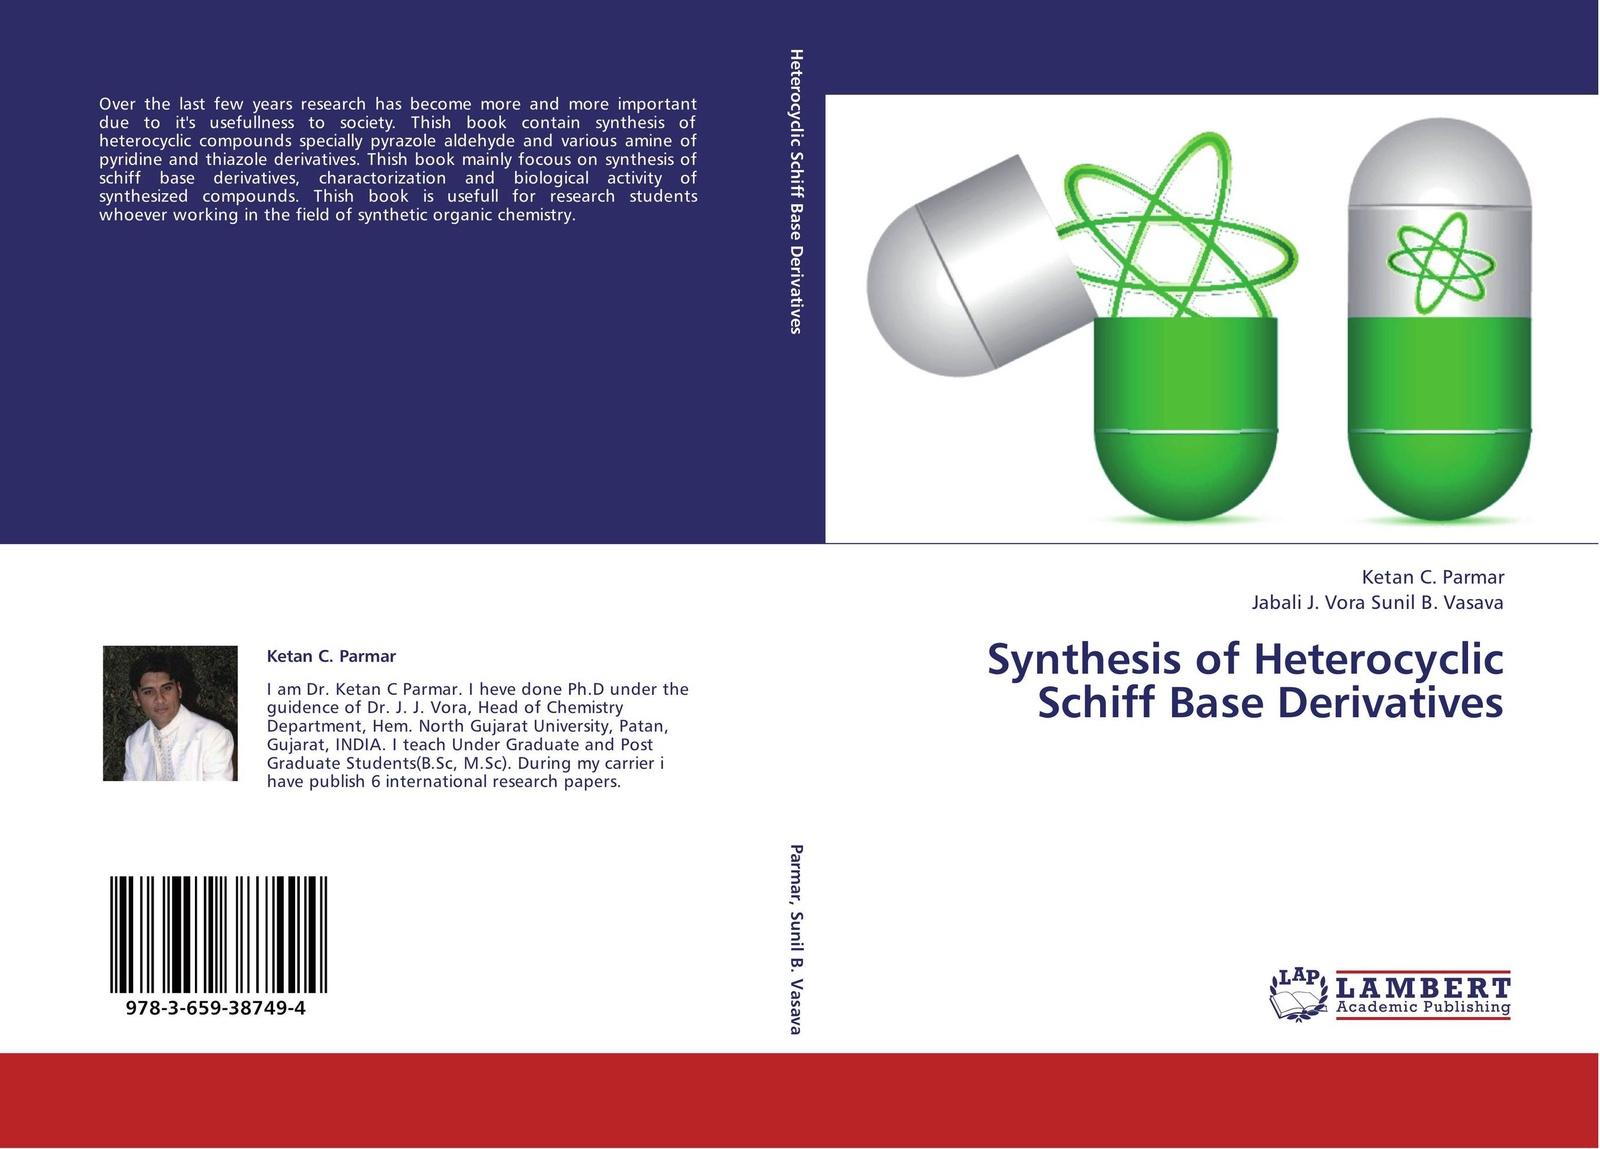 Ketan C. Parmar and Jabali J. Vora Sunil B. Vasava Synthesis of Heterocyclic Schiff Base Derivatives